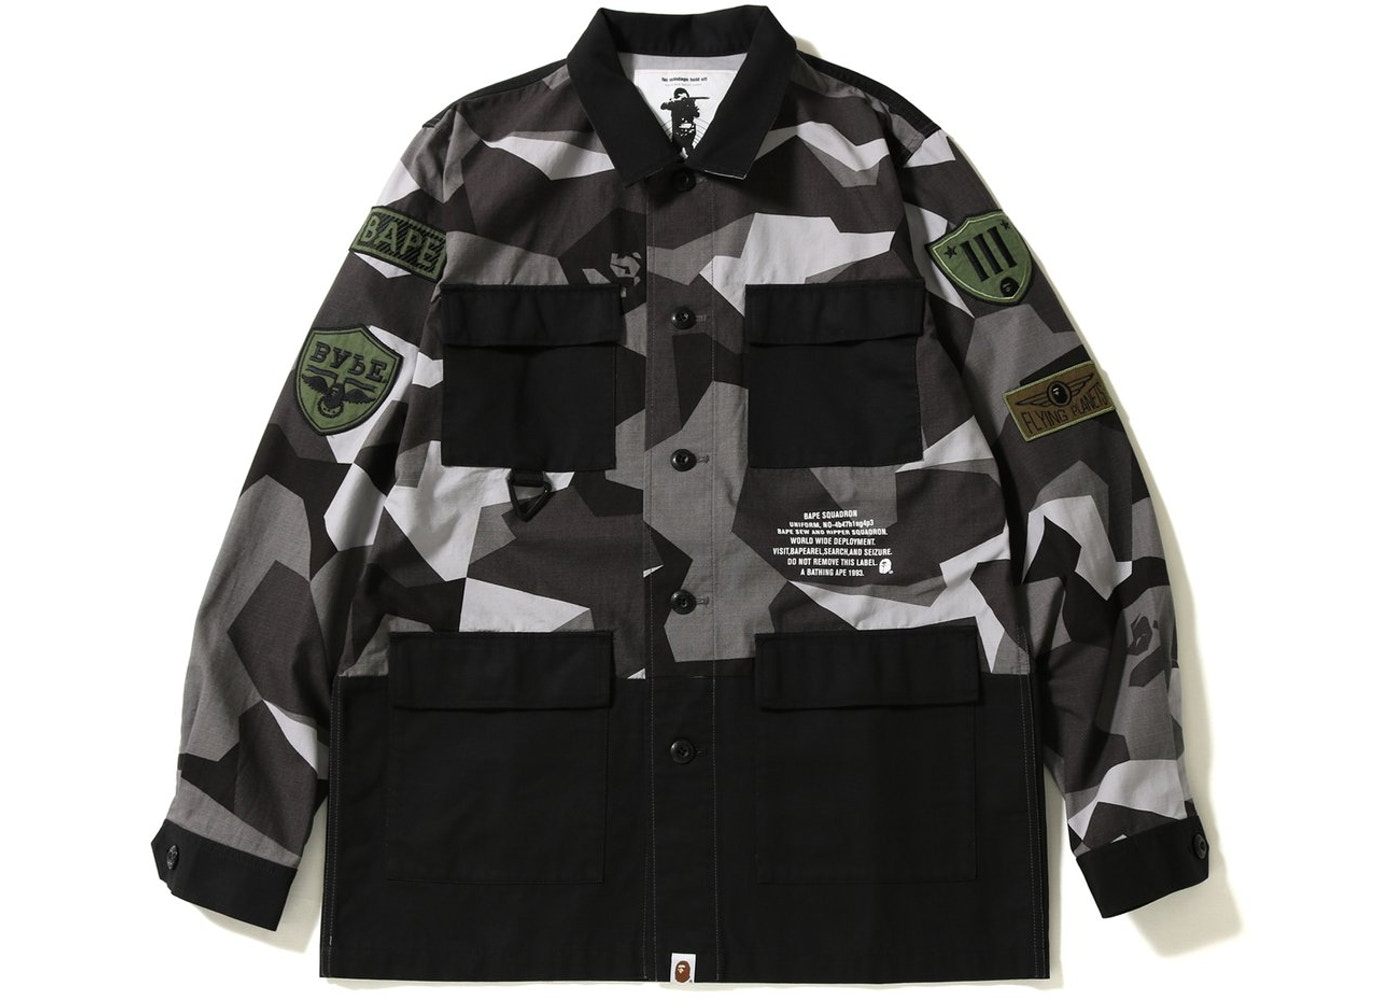 ff2d95c4 Streetwear - Bape Shirts - Highest Bid